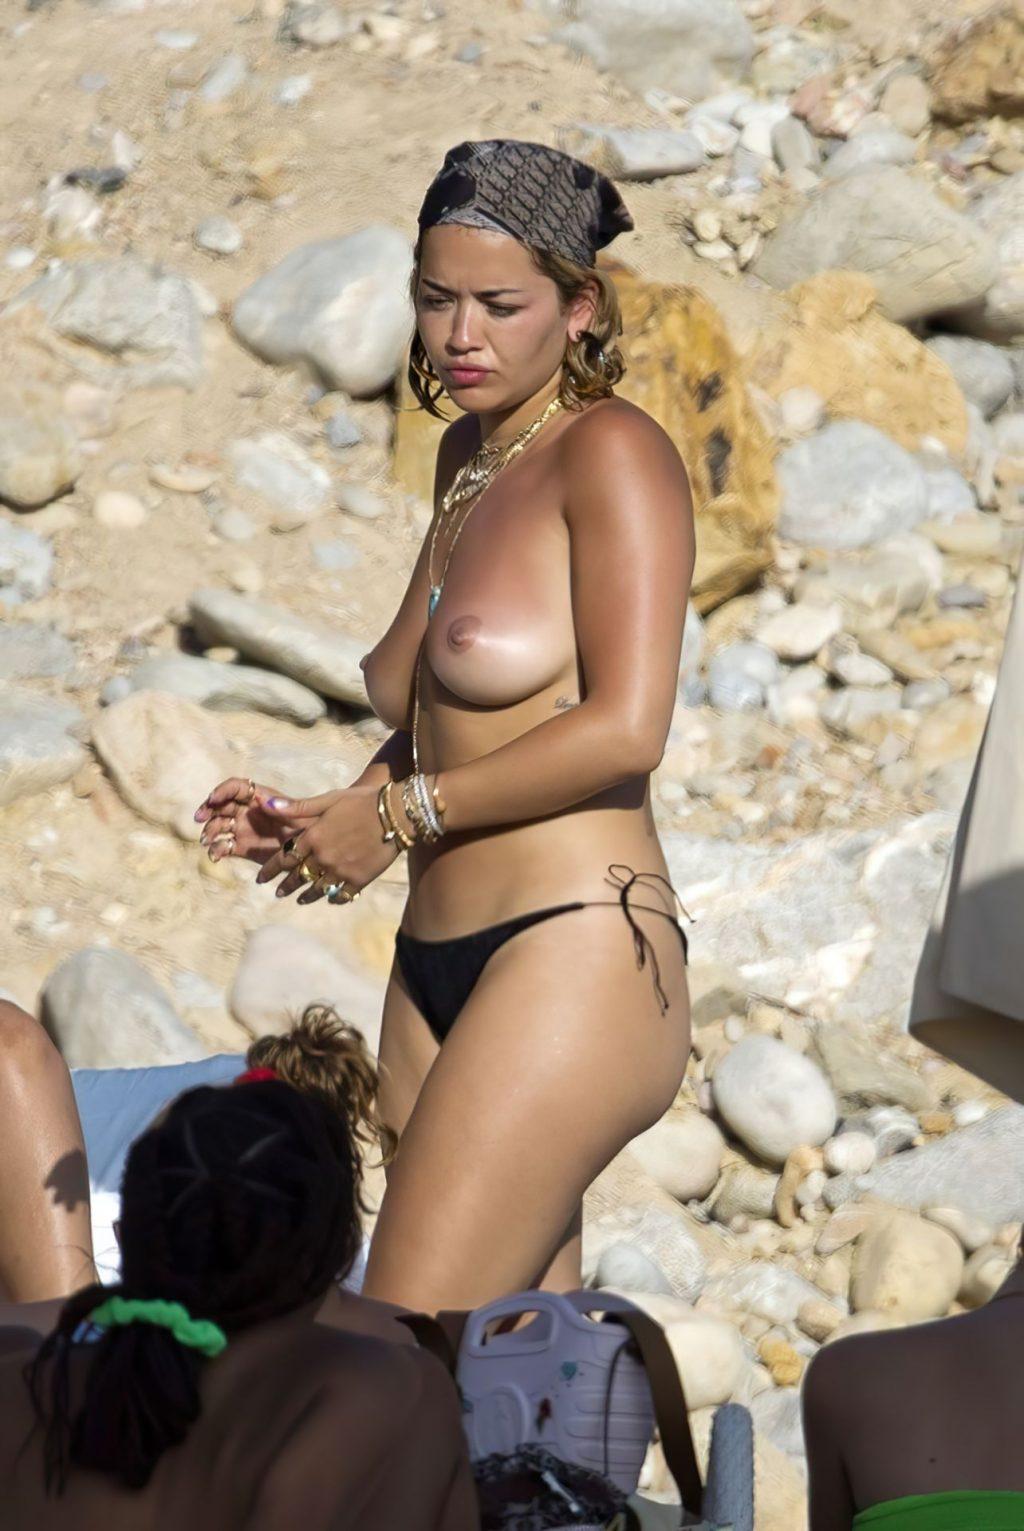 Rita Ora Shows Off Her Nude Boobs While on Vacation (24 Photos)